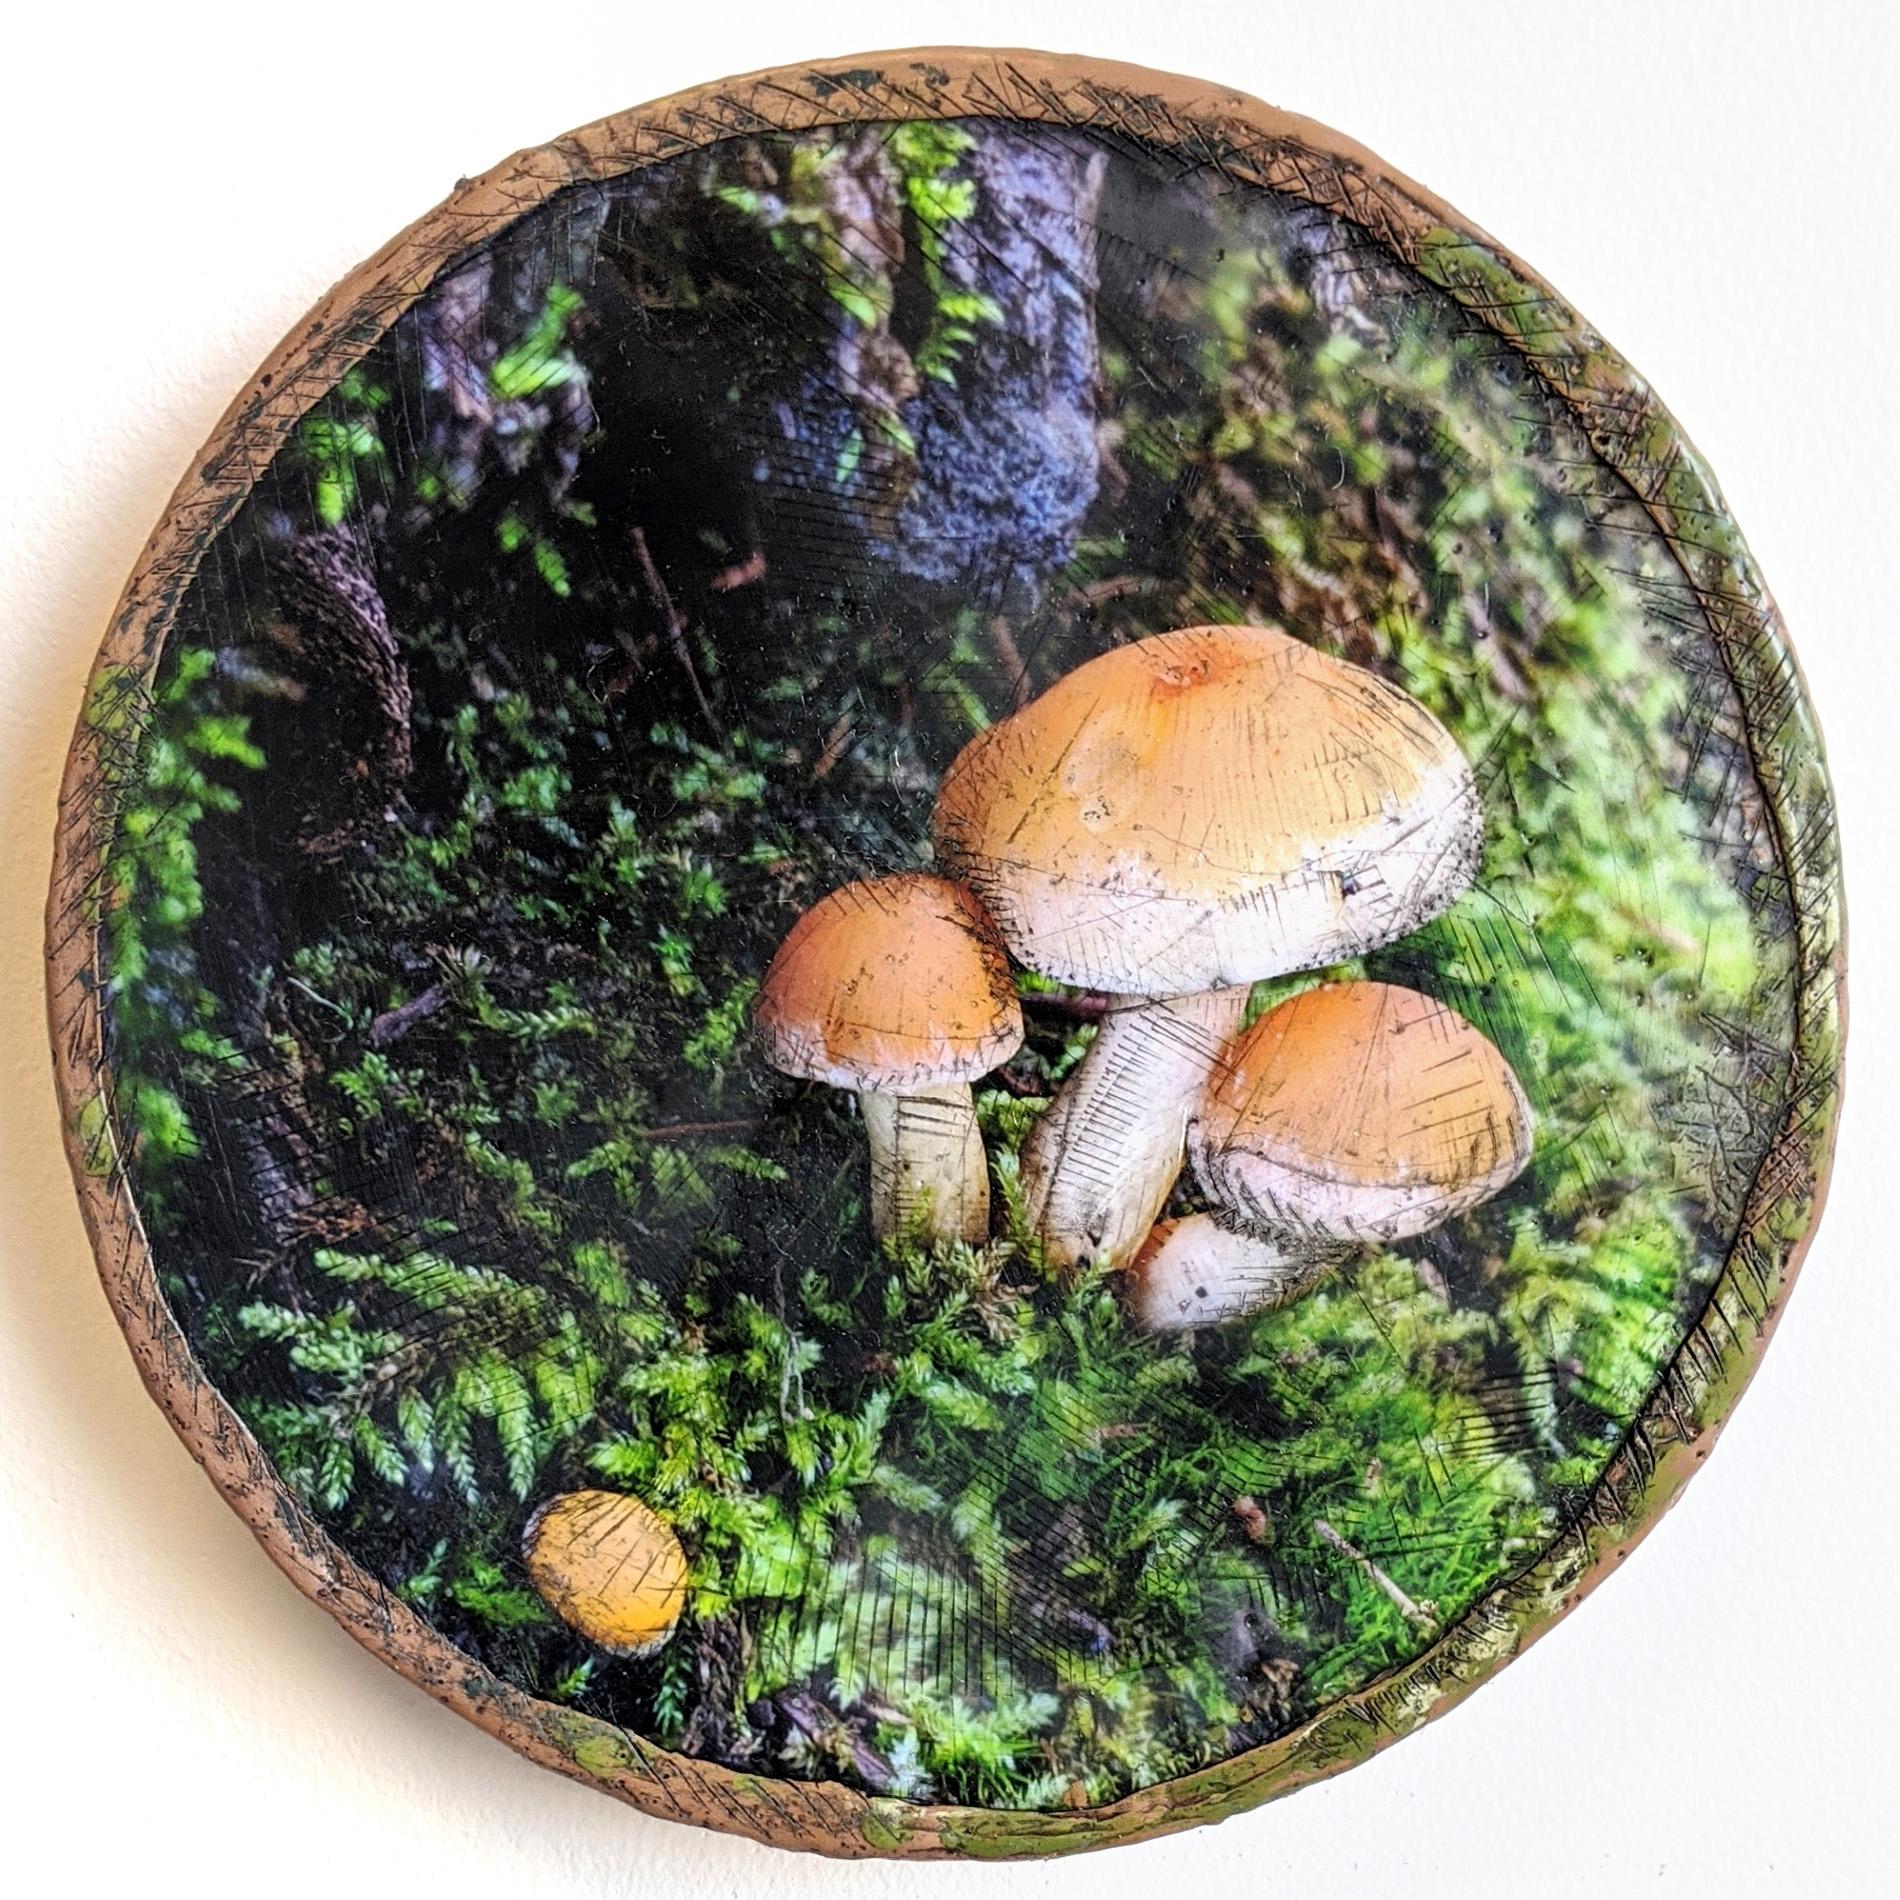 mushroom_lowrez_taramcdermott